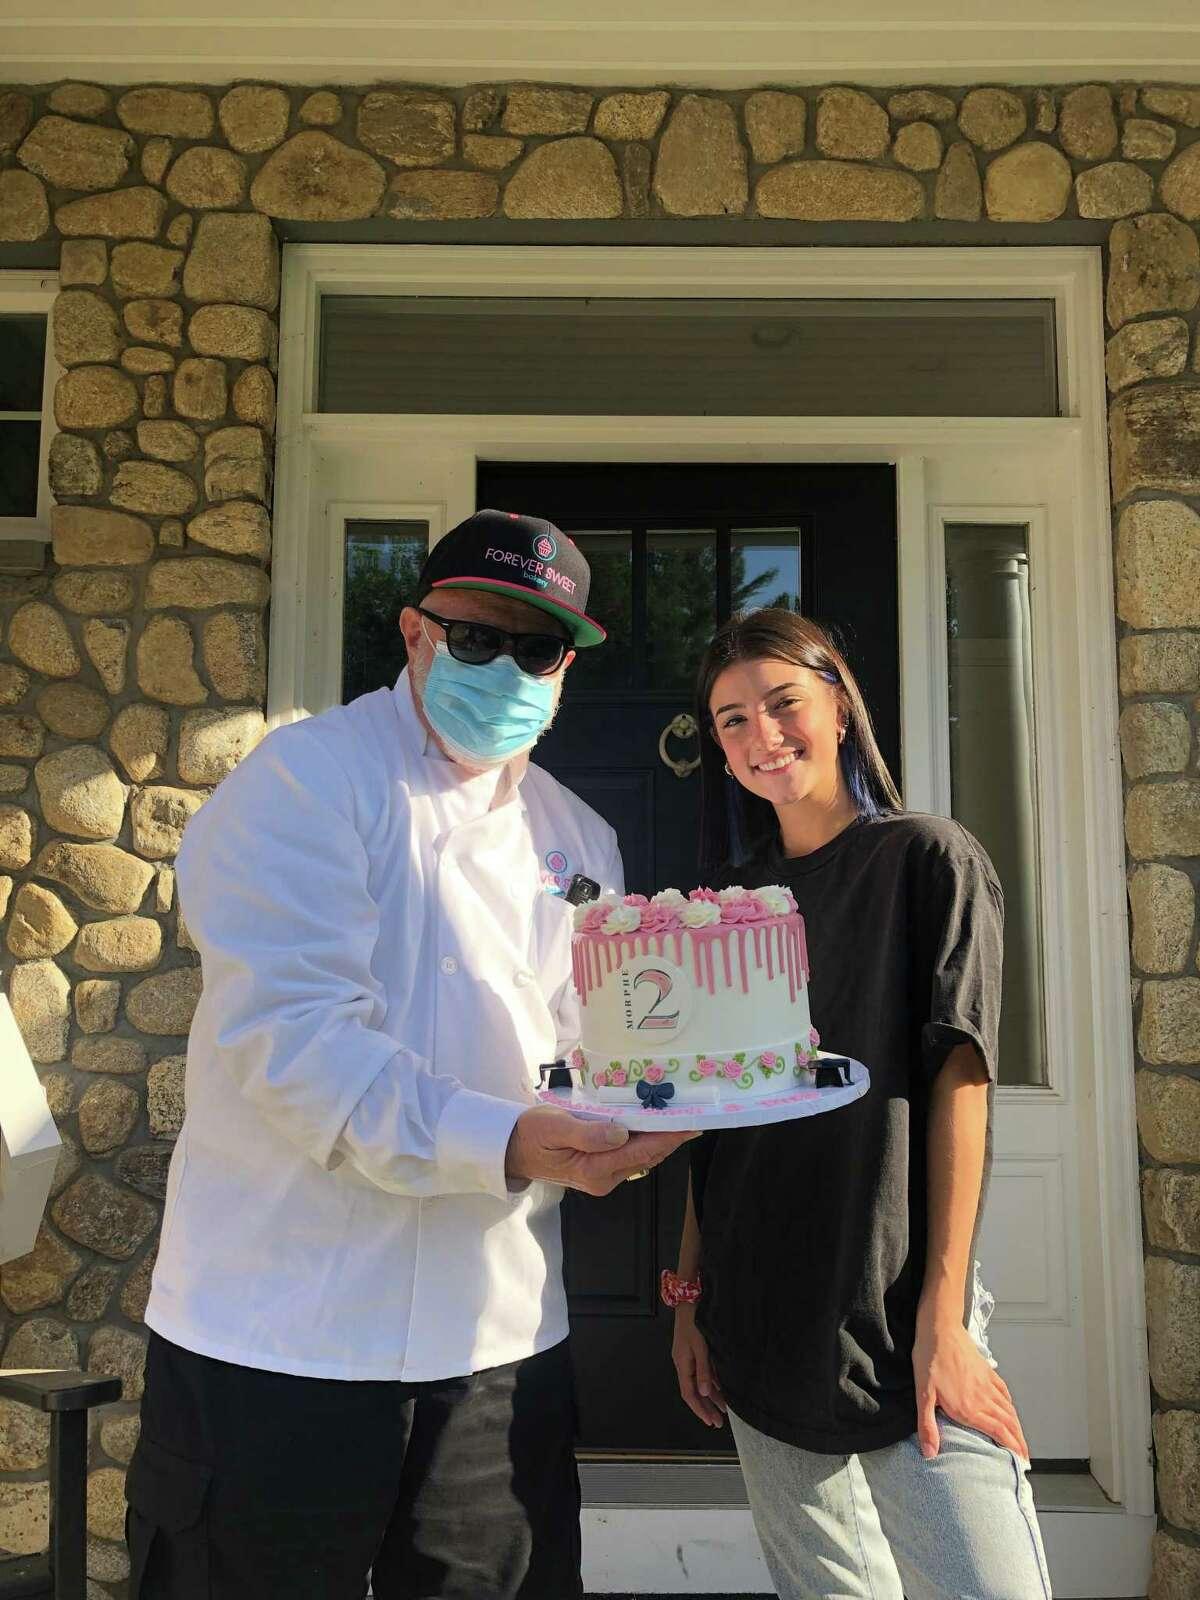 Social Media star Charli D'Amelio with SKY Mercede in front of Forever Sweet Bakery in Norwalk.